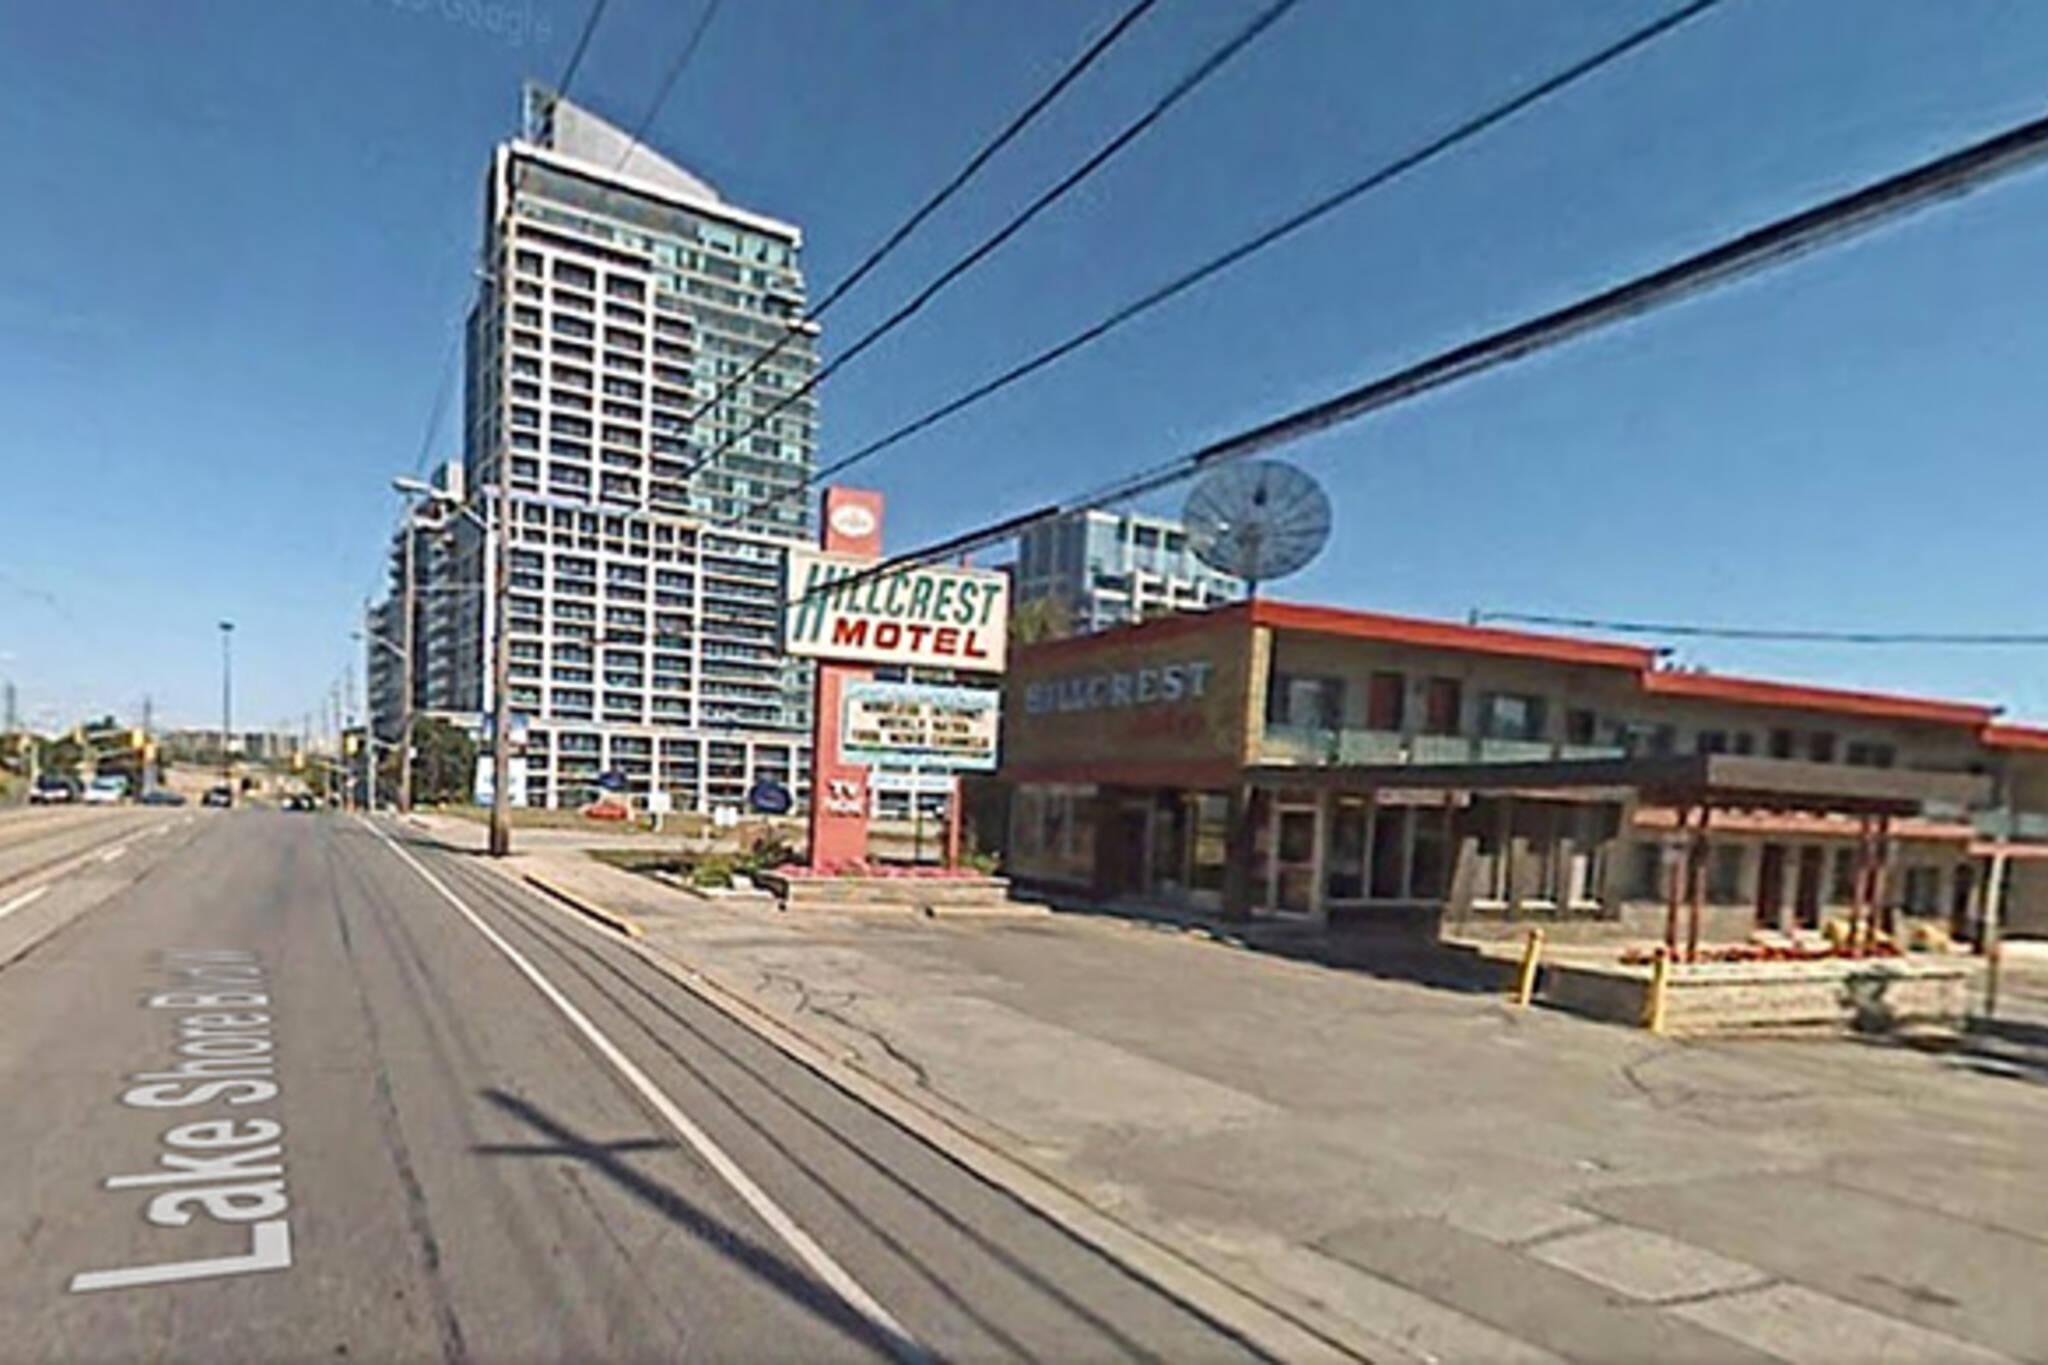 Google Street View Toronto 2007